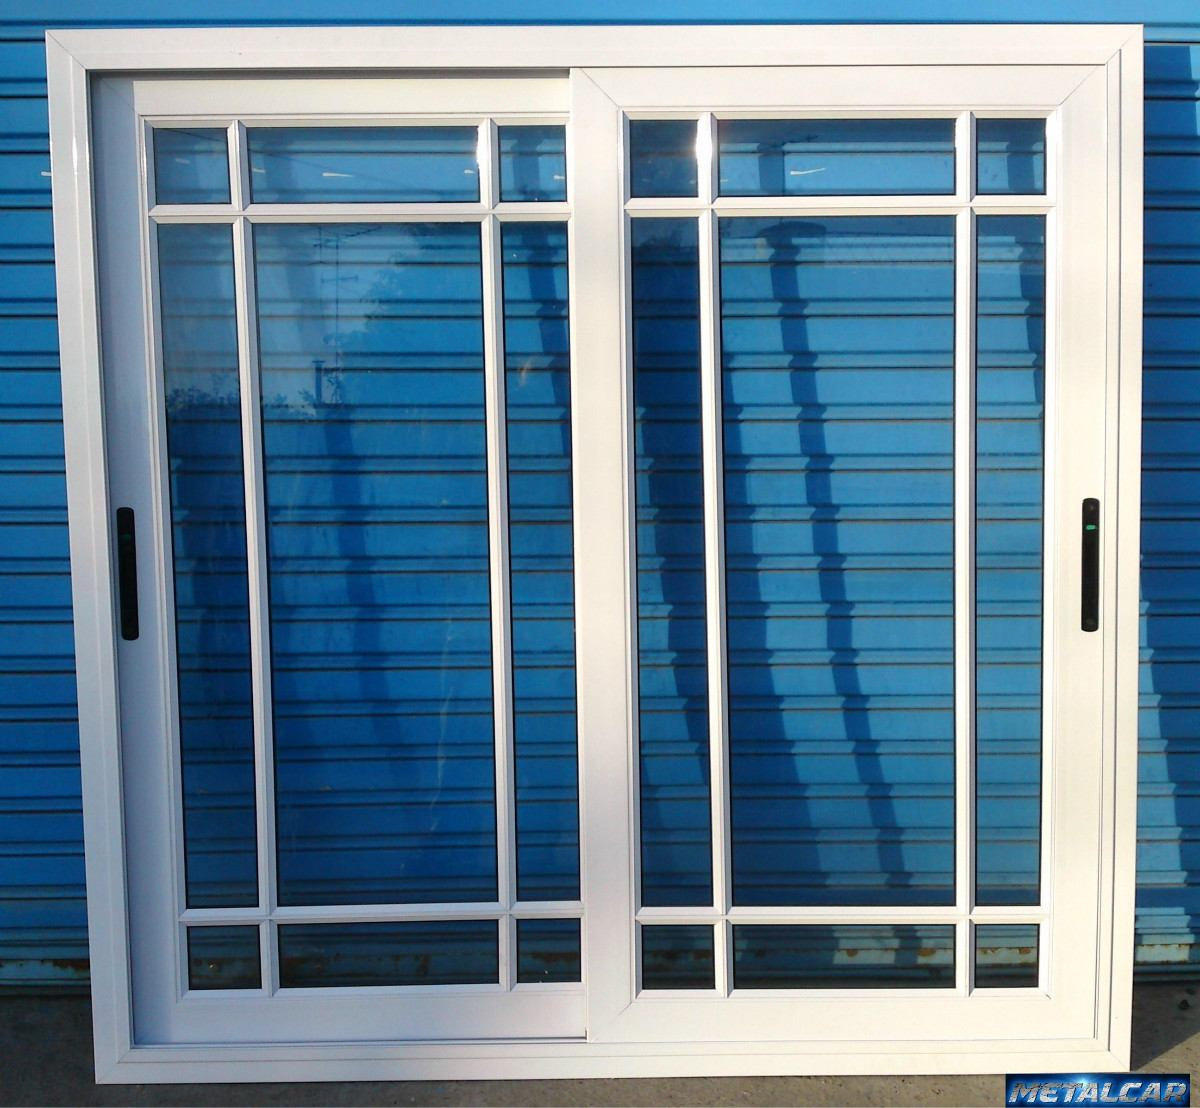 puerta corrediza para bao oblakpin pin puertas de aluminio linea standard puertas de aluminio linea puerta corrediza para bao oblak with ventanas de